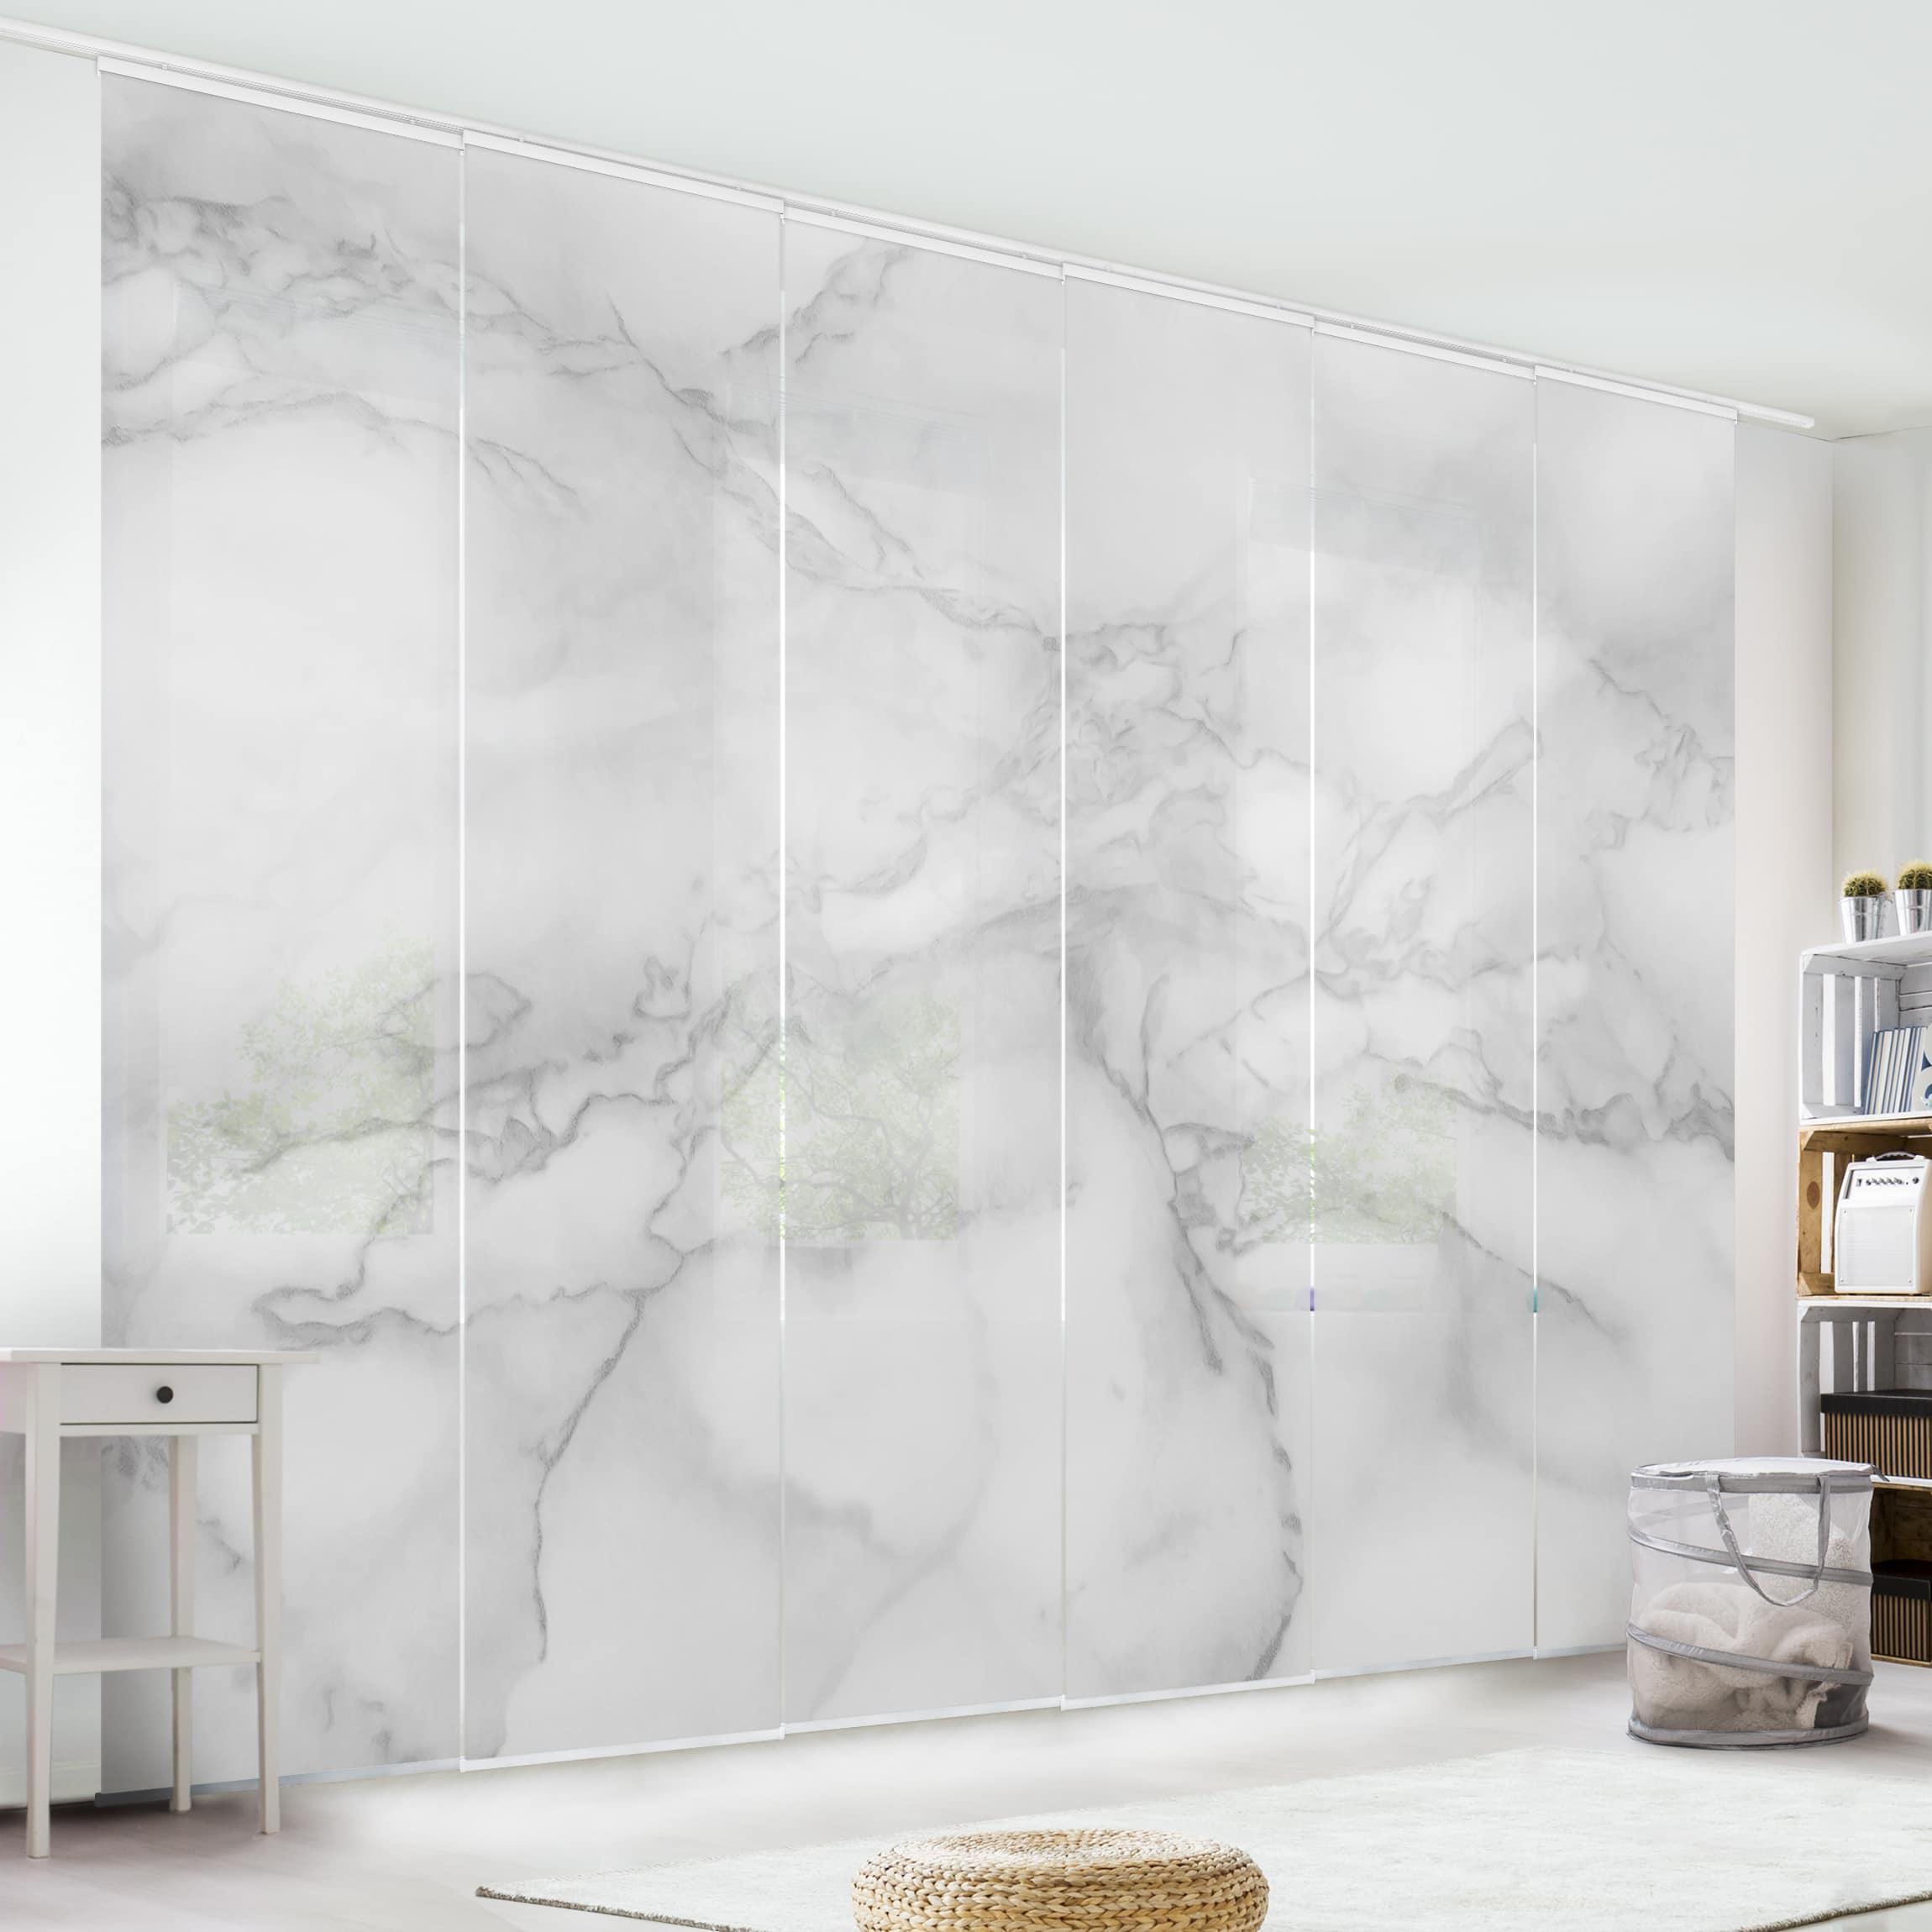 schiebegardinen set marmoroptik schwarz wei 6. Black Bedroom Furniture Sets. Home Design Ideas